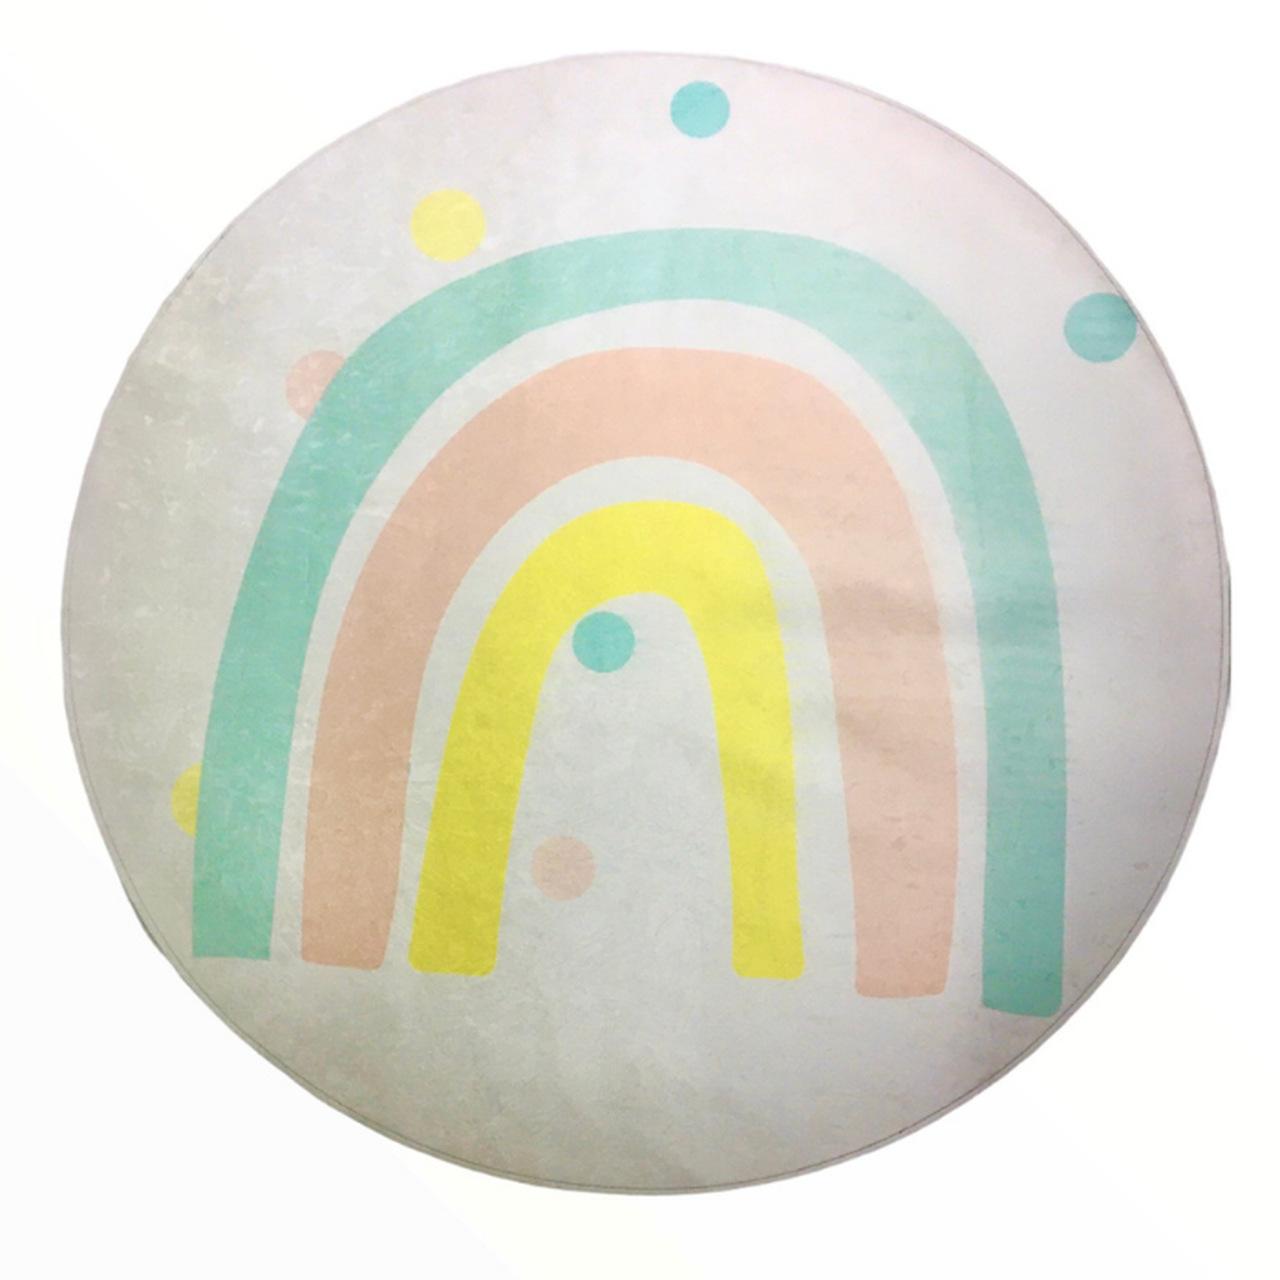 Tapete redondo quarto infantil estampa Arco íris candy